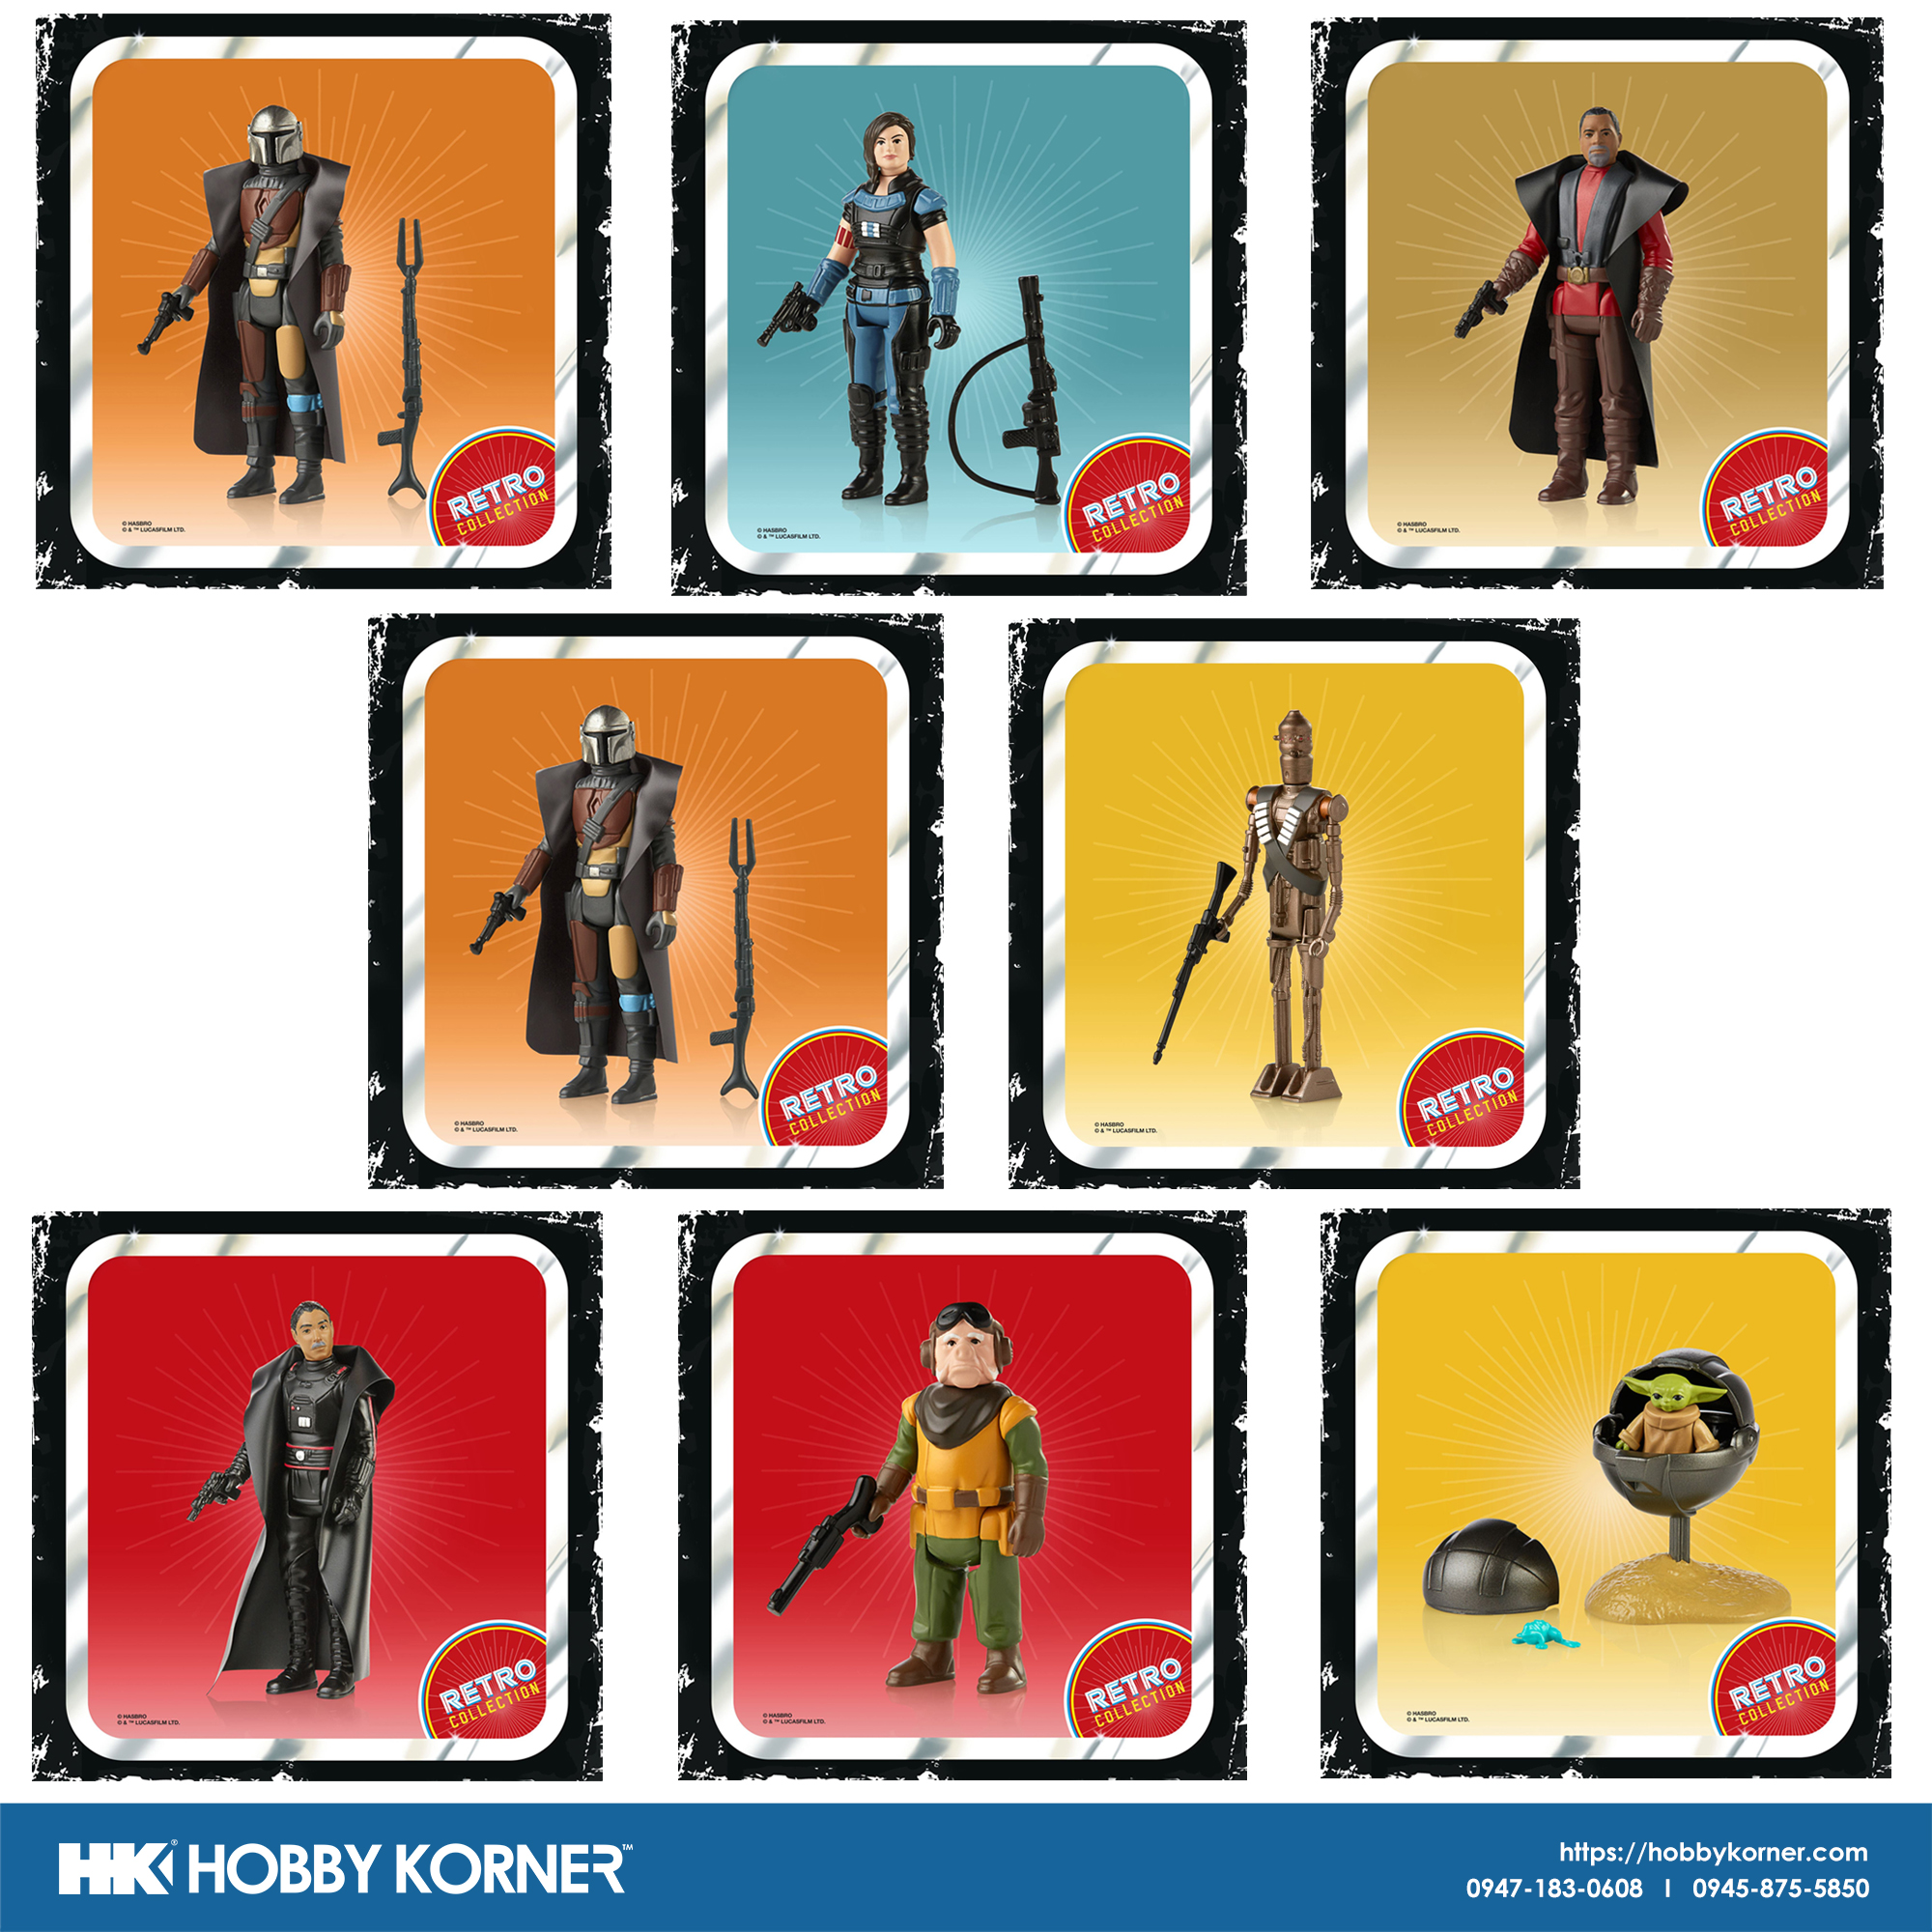 Star Wars The Clone Wars Custom 3.75 Pre Vizsla Phase II Helmet for Hasbro TVC